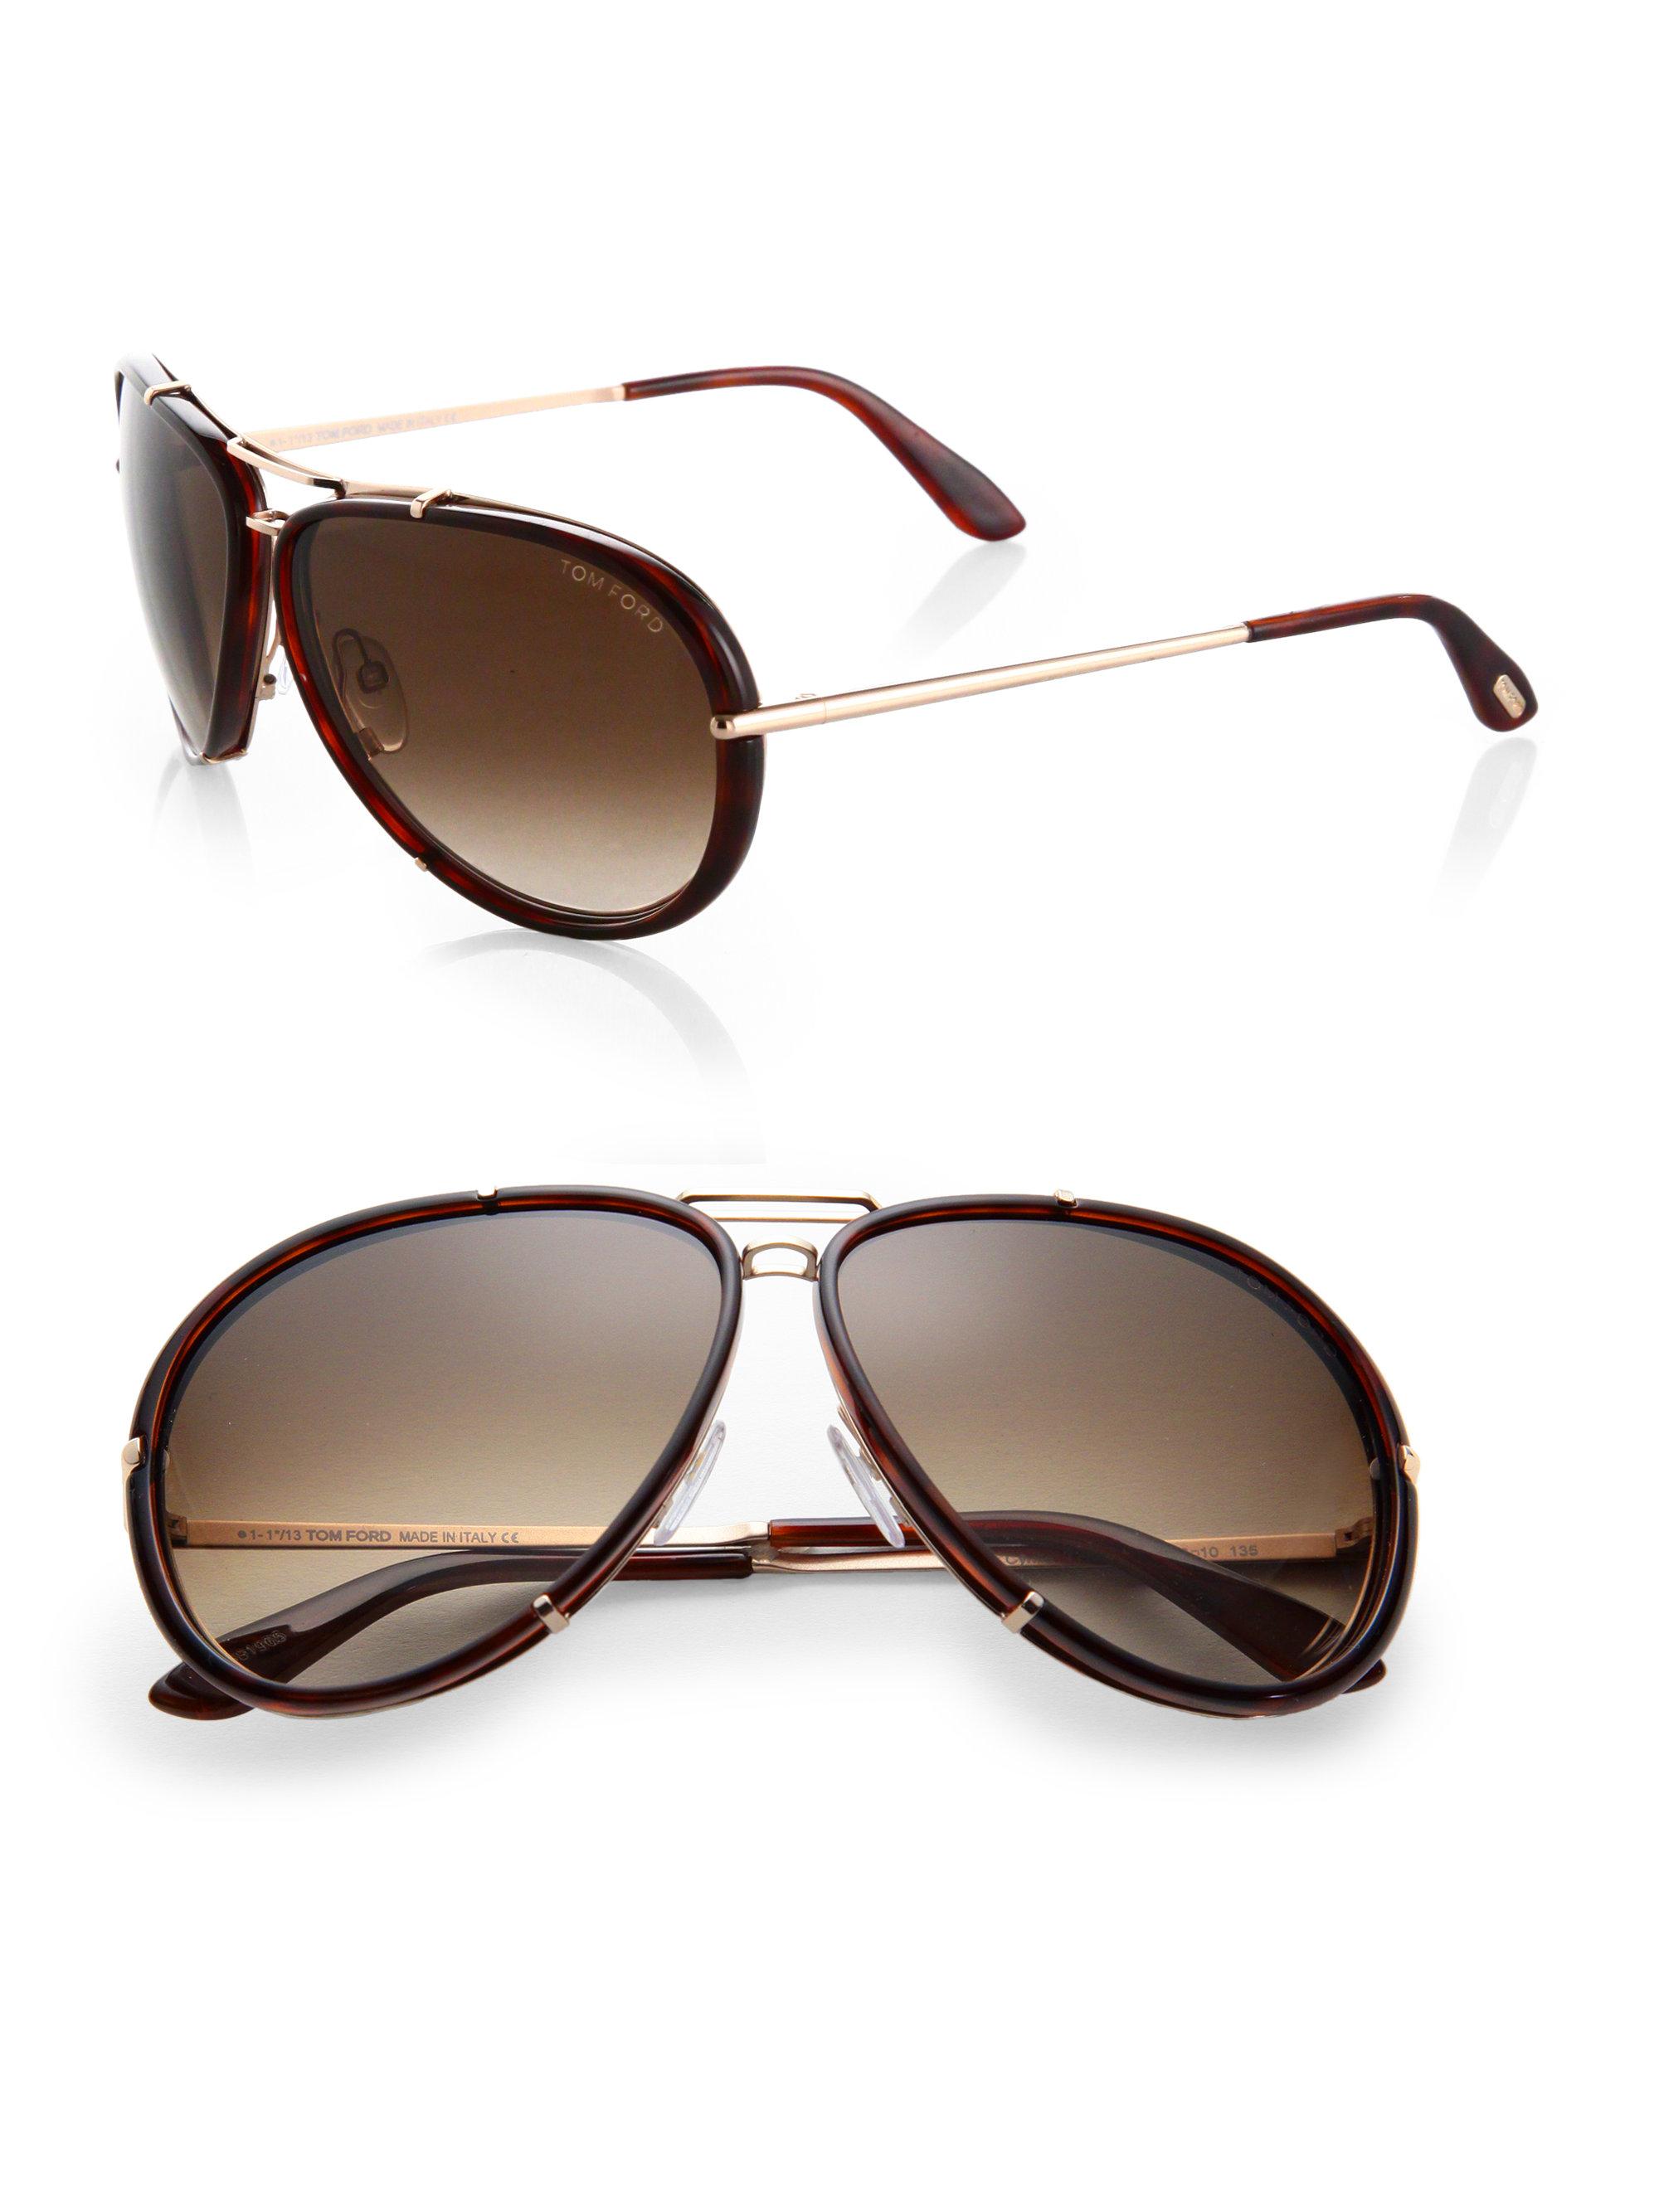 a702fbb21da Tom Ford Cyrille 63Mm Aviator Sunglasses in Brown